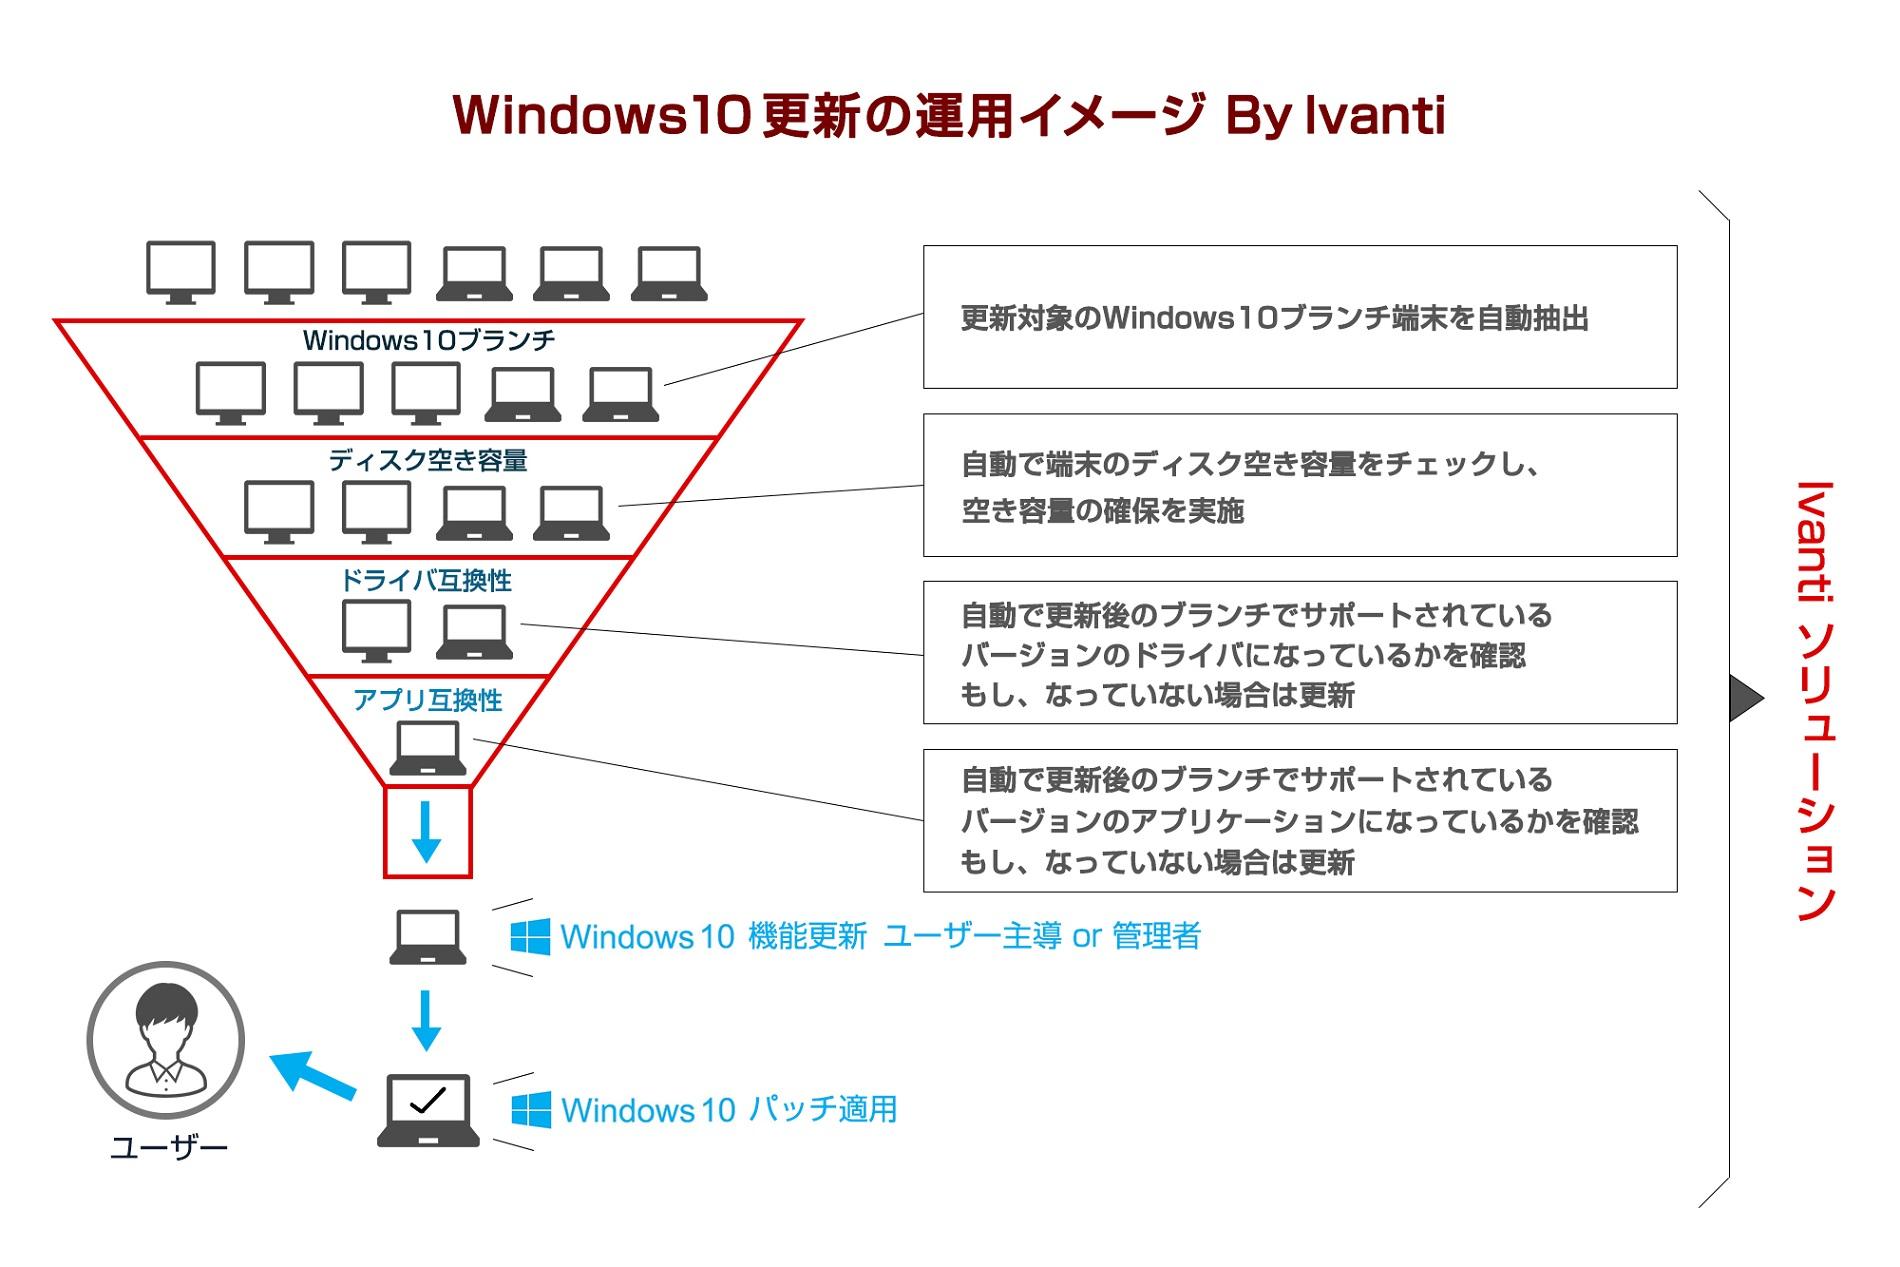 Windows10更新の運用イメージ By Ivanti